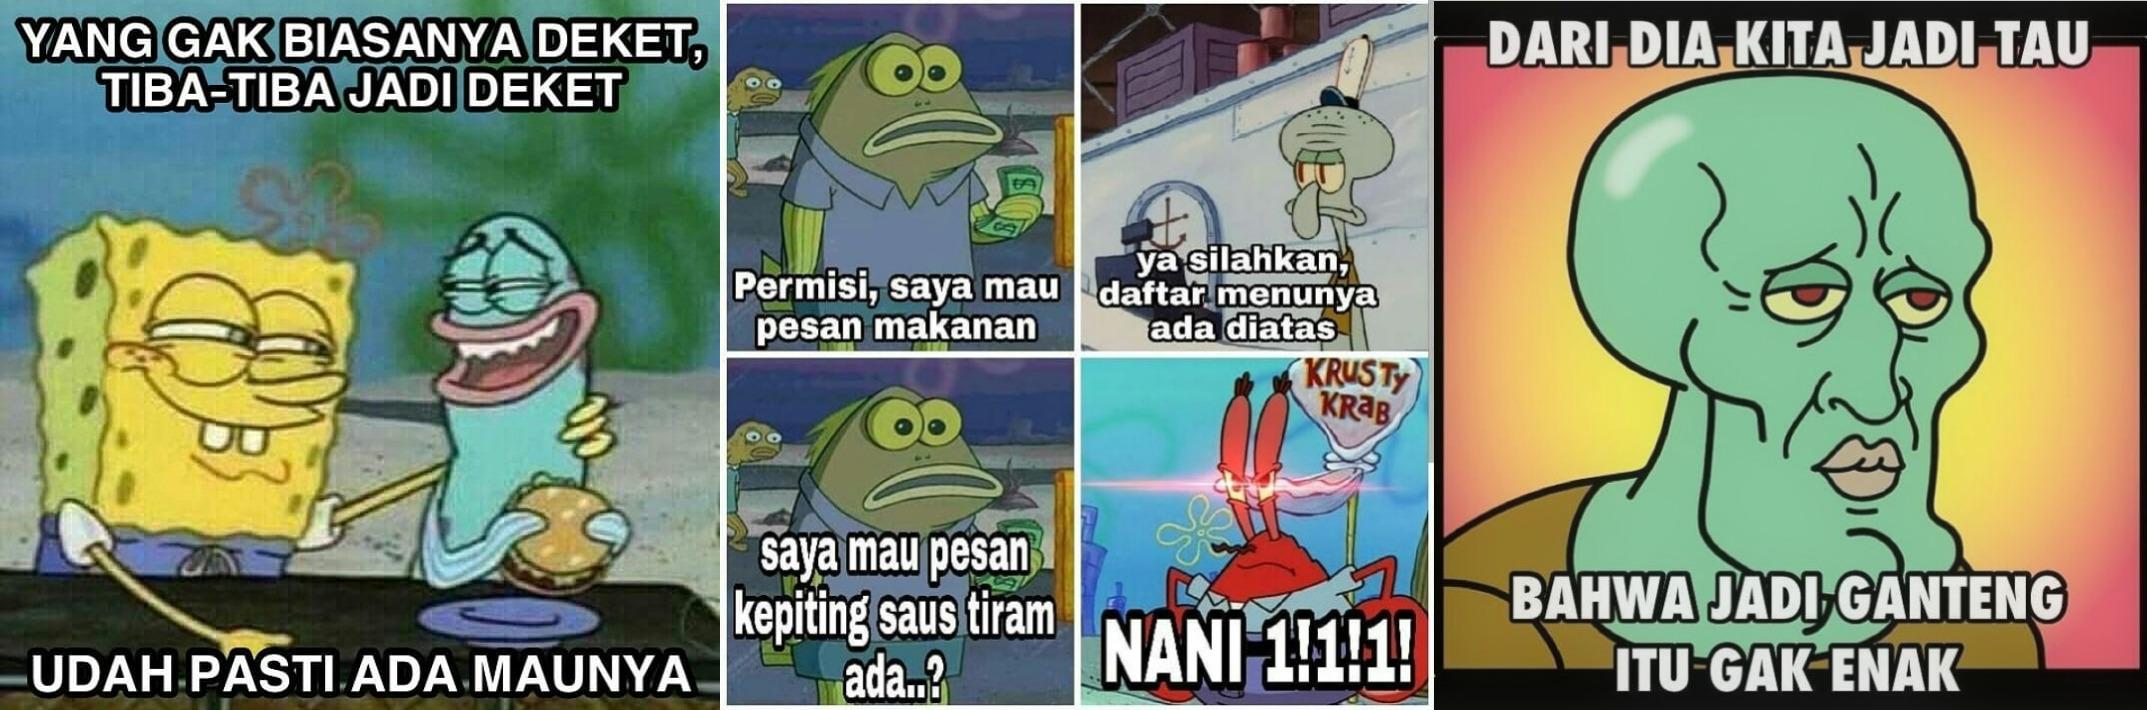 15 Meme Logika Konyol Ala Spongebob Ini Bikin Geleng Geleng